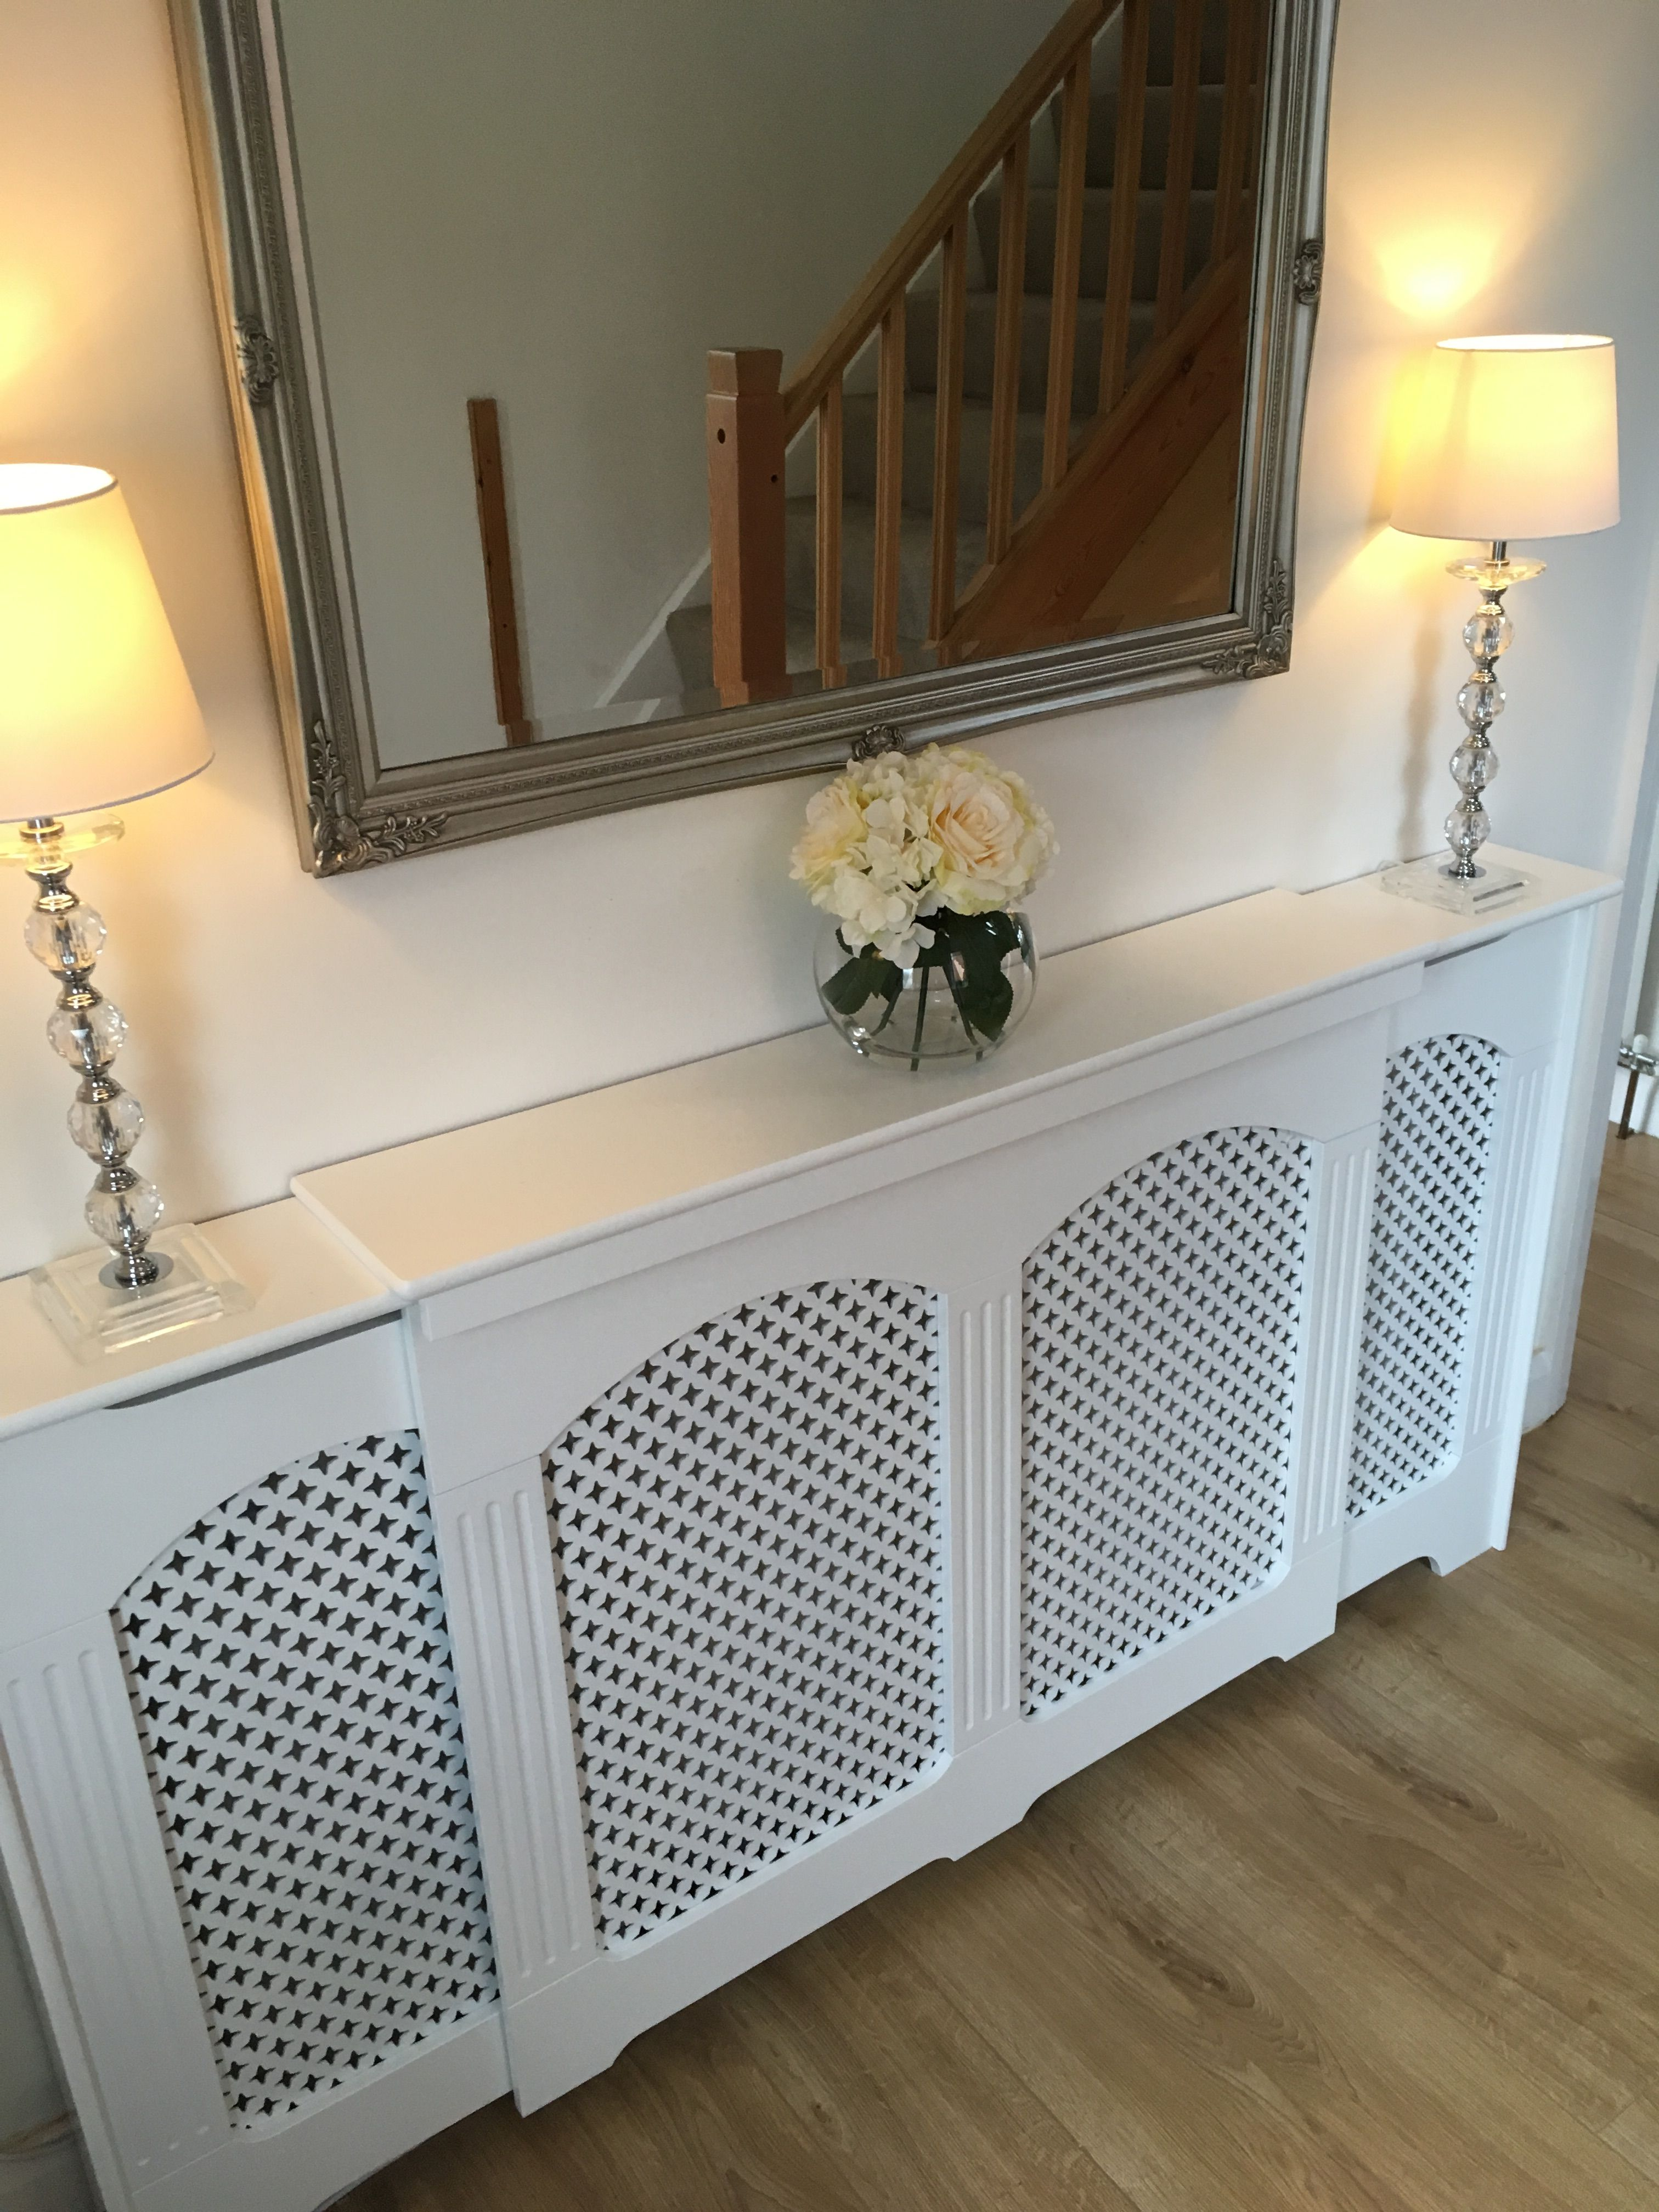 Designer Living Room Radiators: Interior Design Living Room